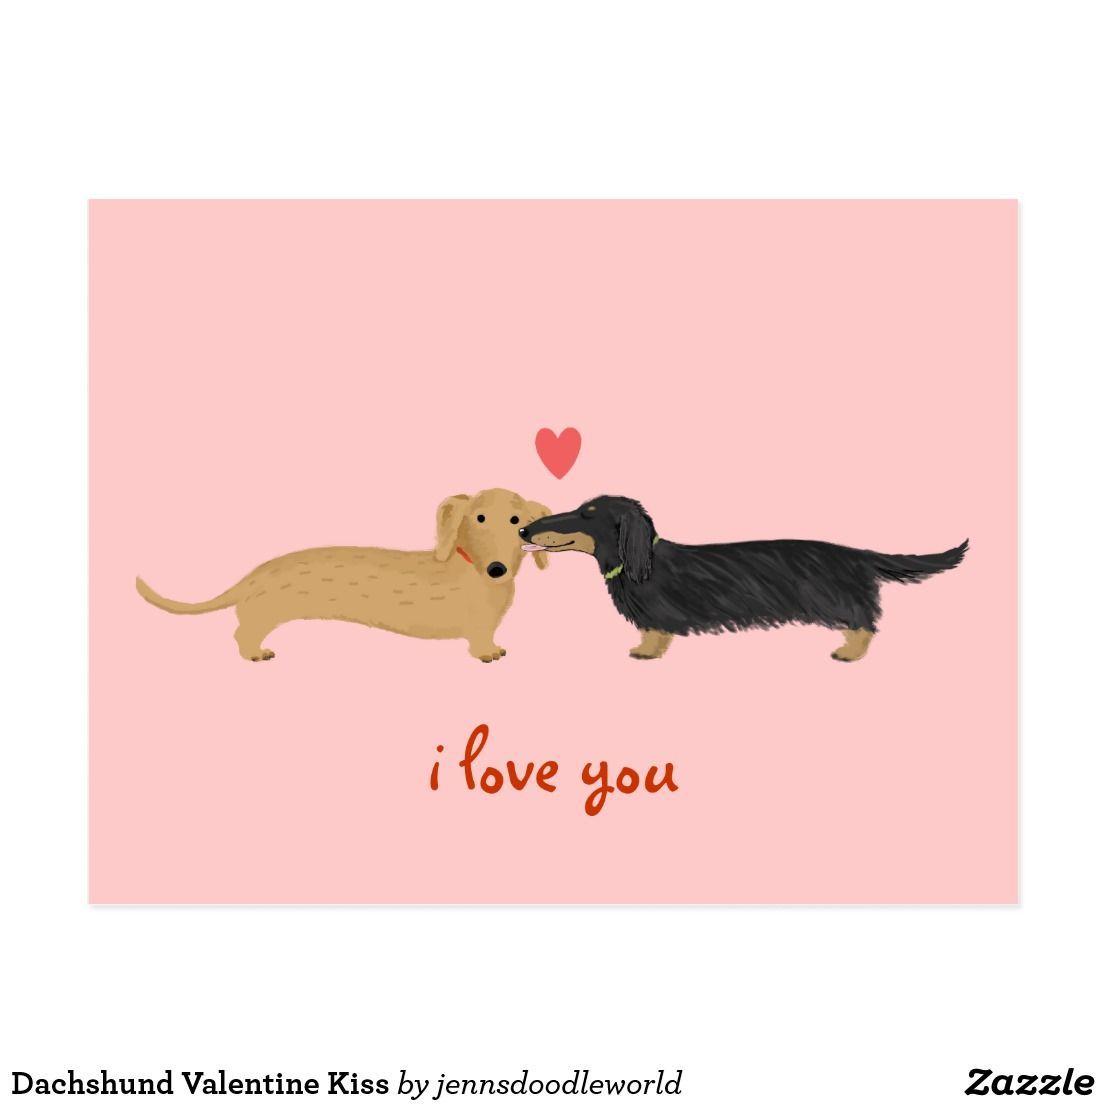 Dachshund Valentine Kis dachshund Valentine Kiss